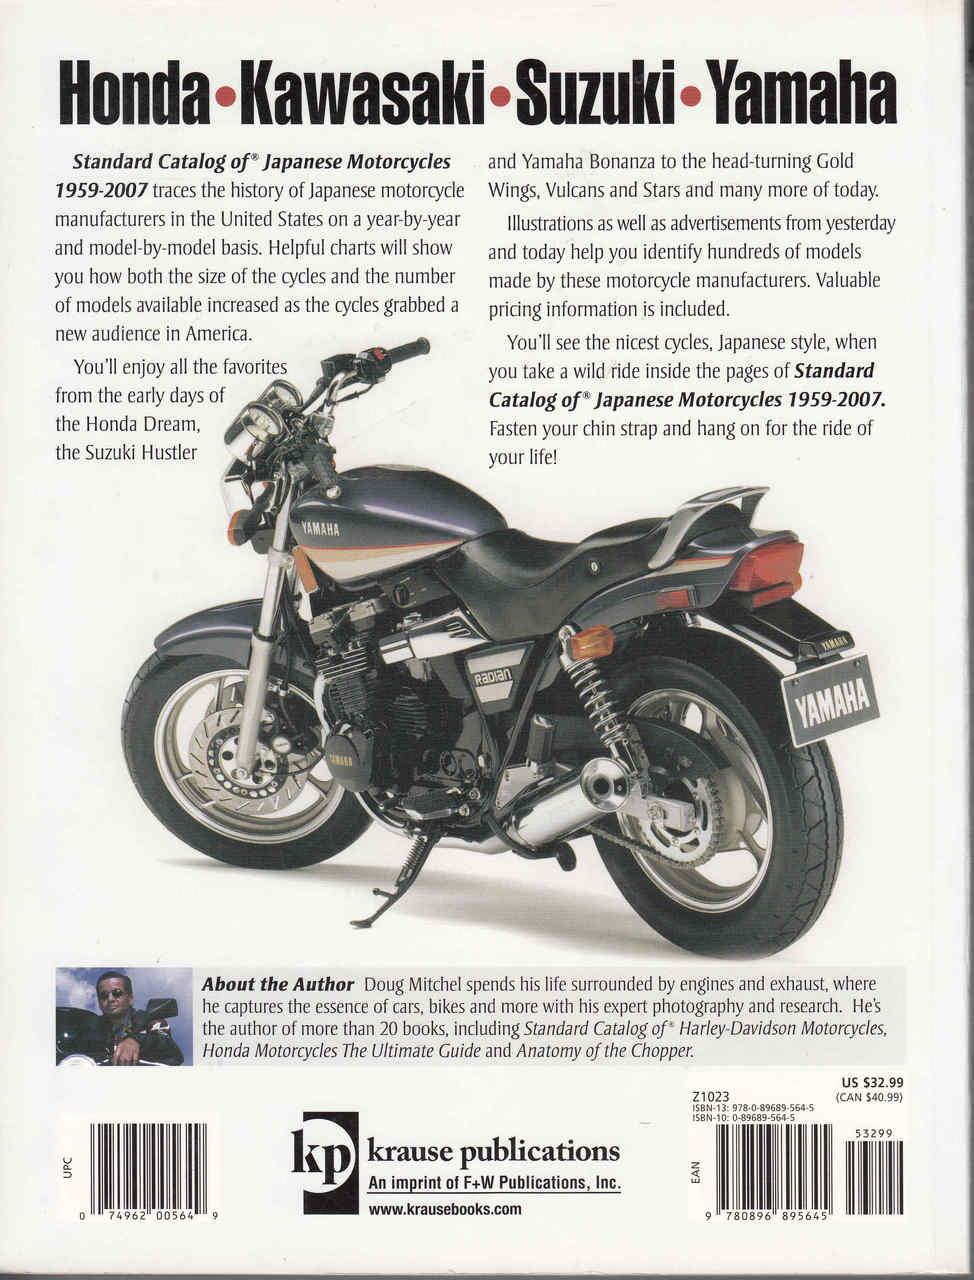 Standard Catalog Of Japanese Motorcycles 1959 - 2007